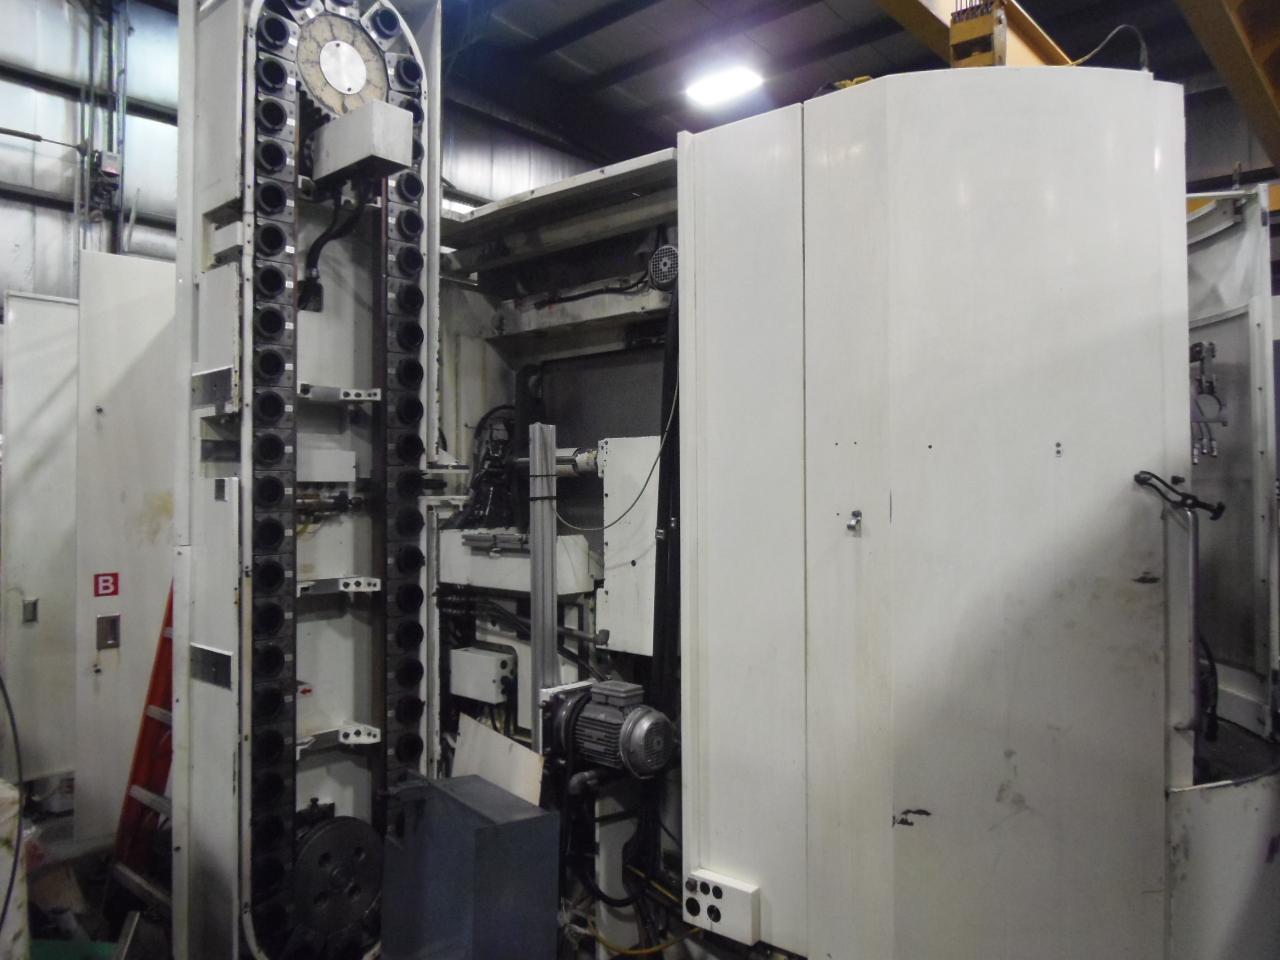 "KITAMURA HX-500i, 19.7"" (2) PALLETS, 4TH AXIS, 50 TAPER, 50 ATC, 12,000 RPM, TSC, 2006"